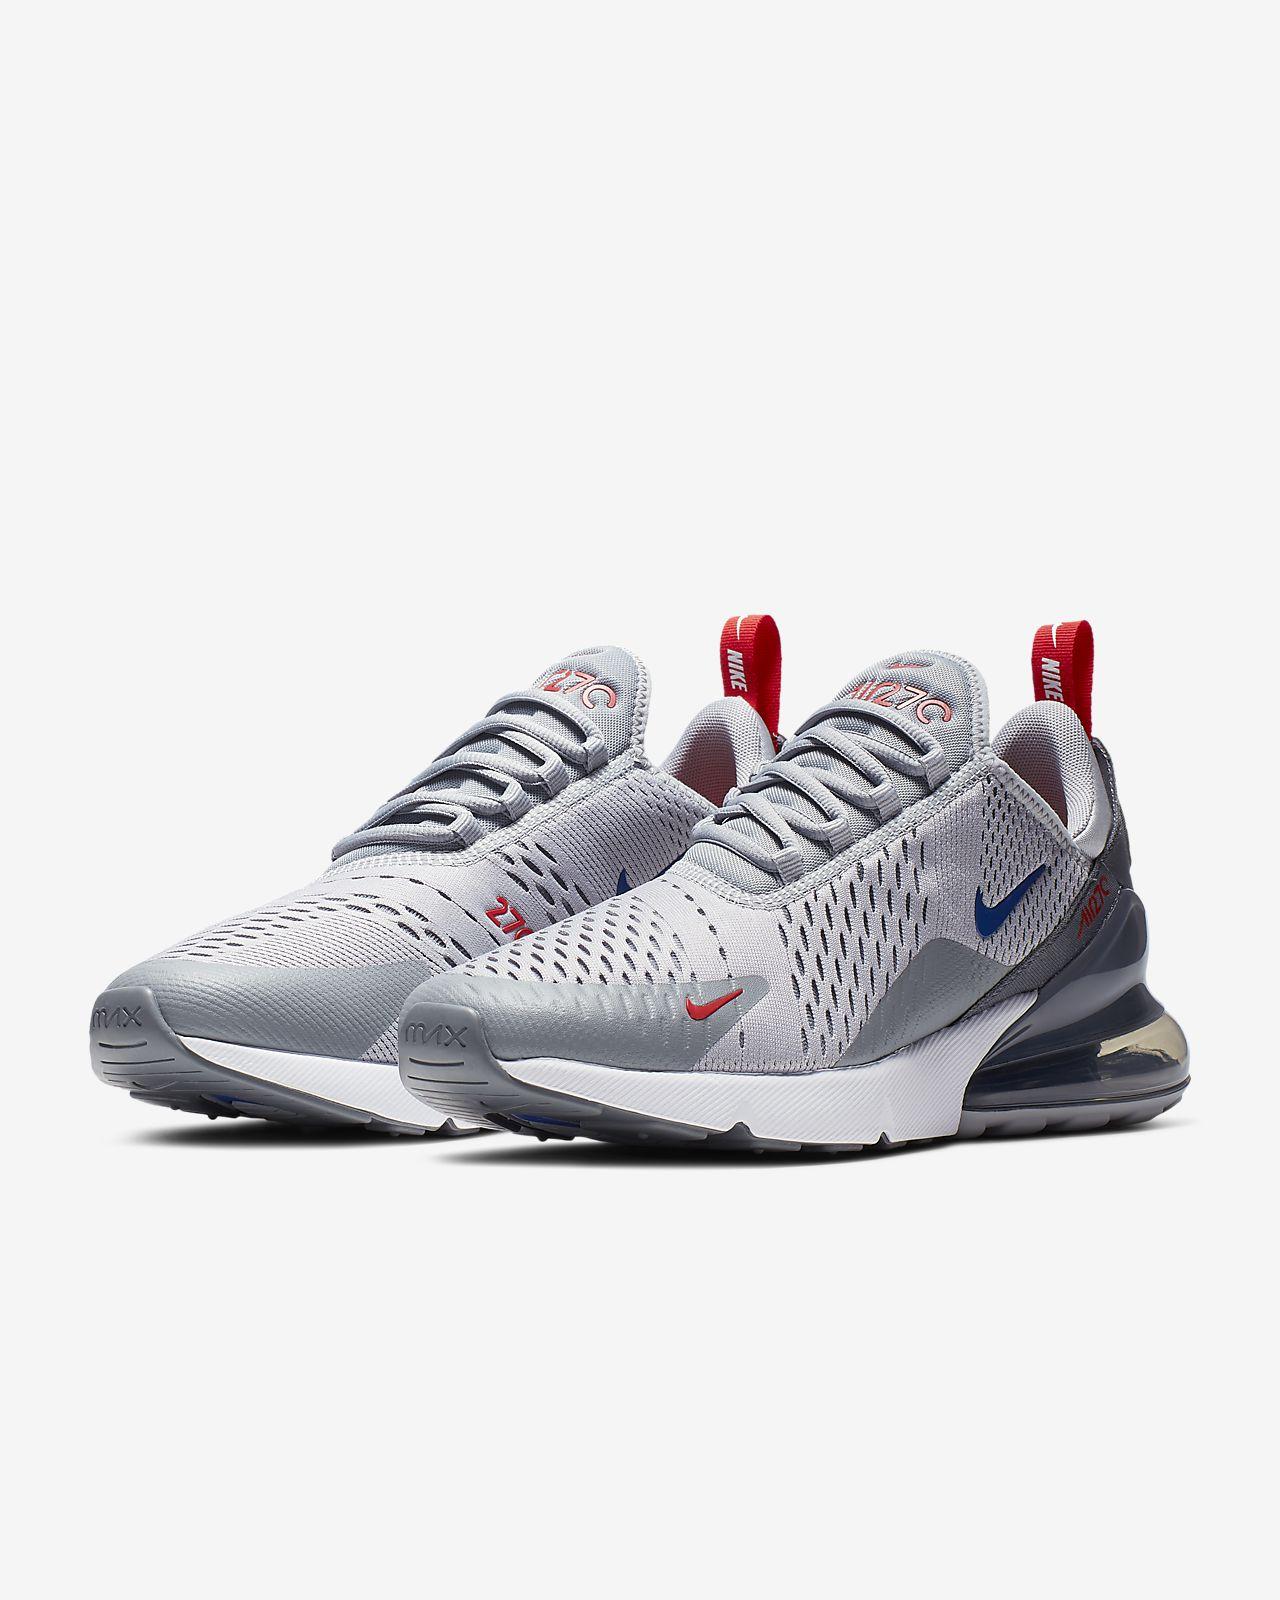 b7687459bfe1 Nike Air Max 270 férficipő. Nike.com HU